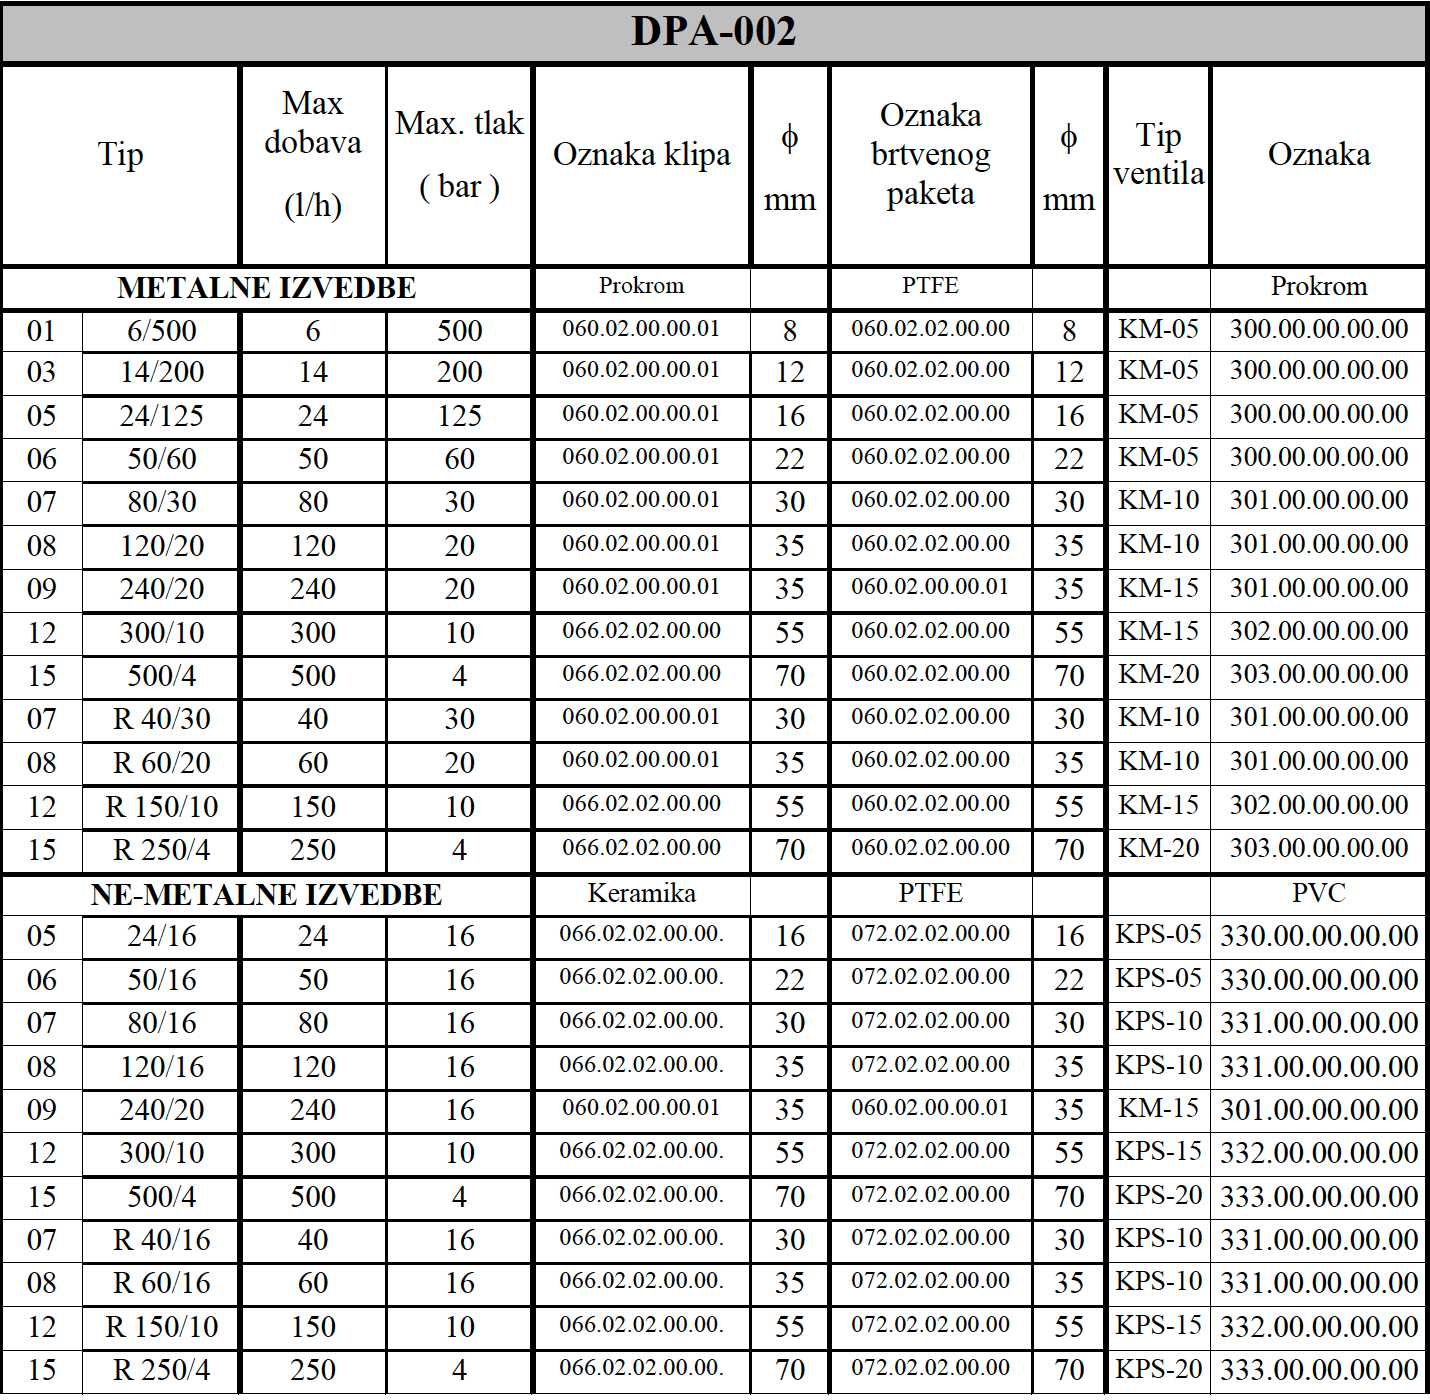 DPA 002 tablica 1